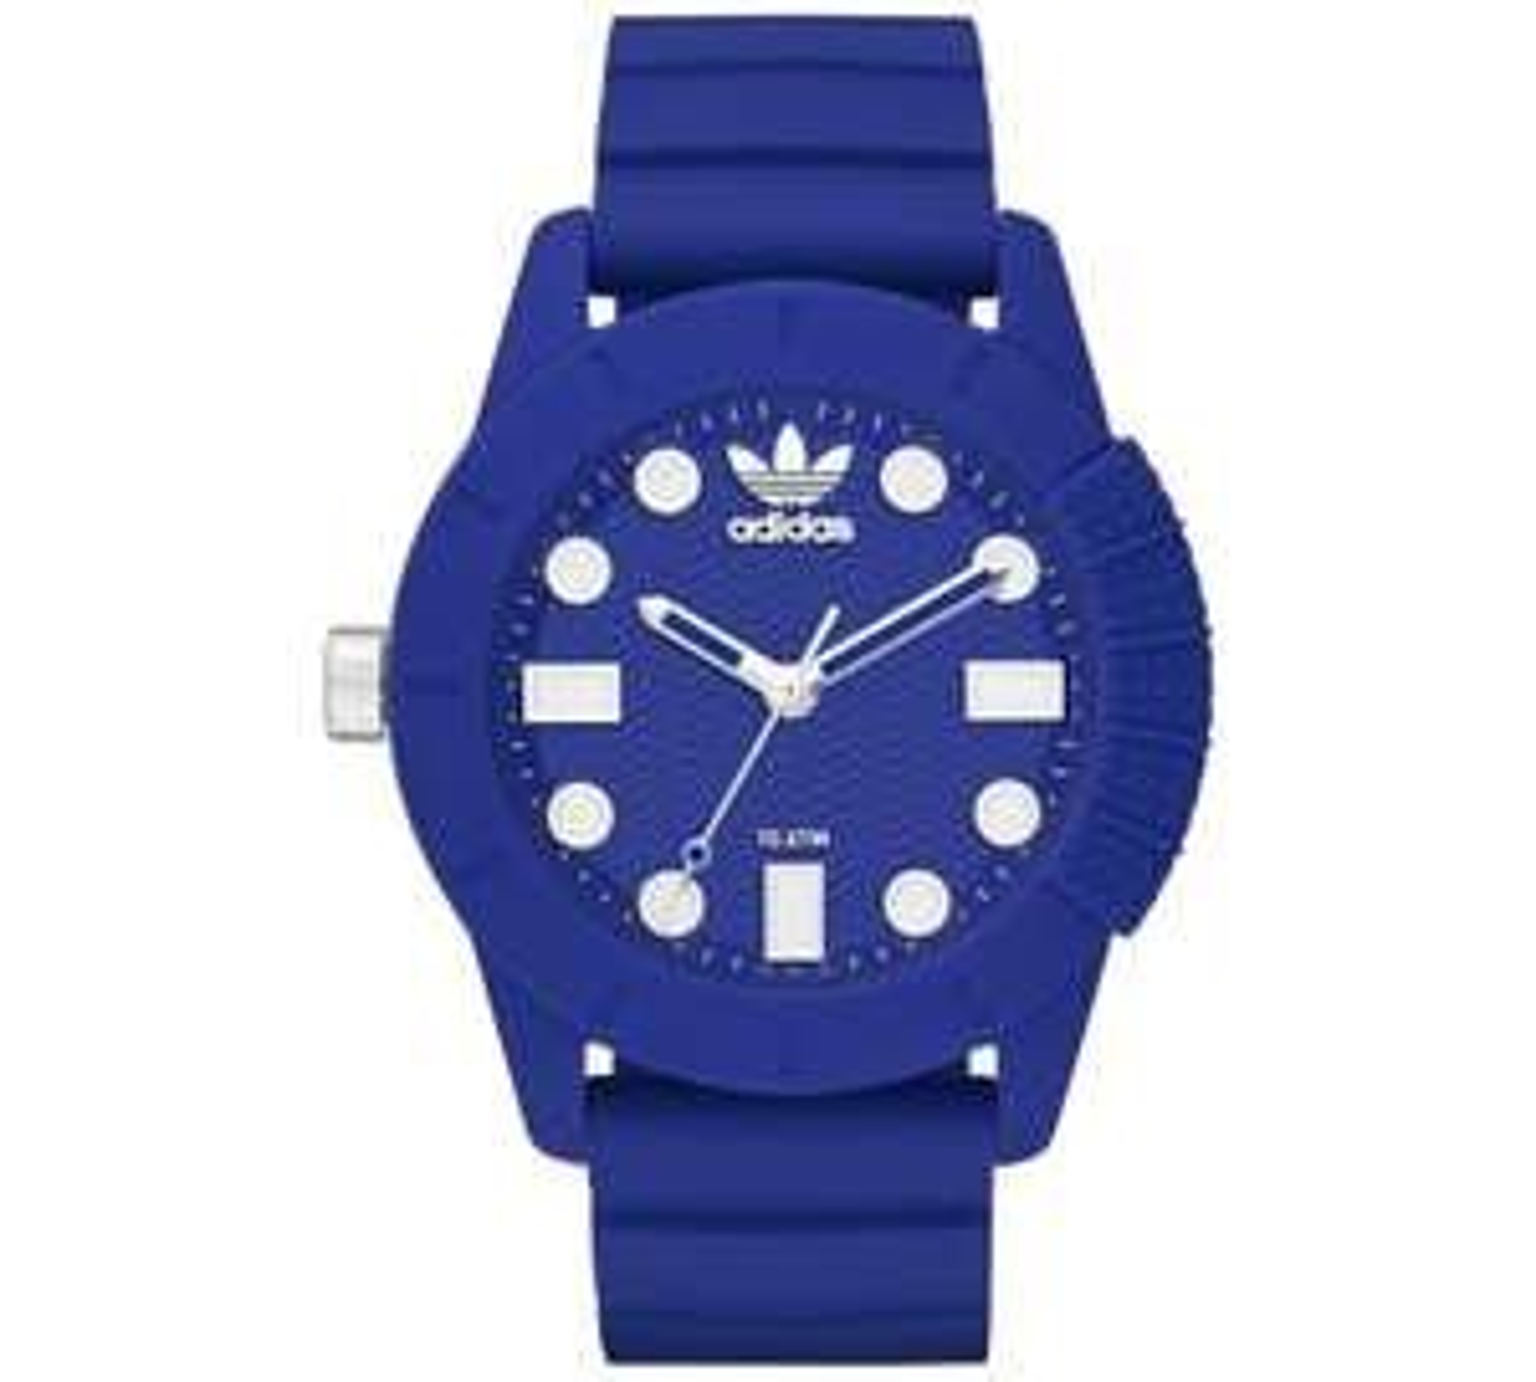 Adidas Originals ADH3103 Blue Silicone Watch £14.99 Argos